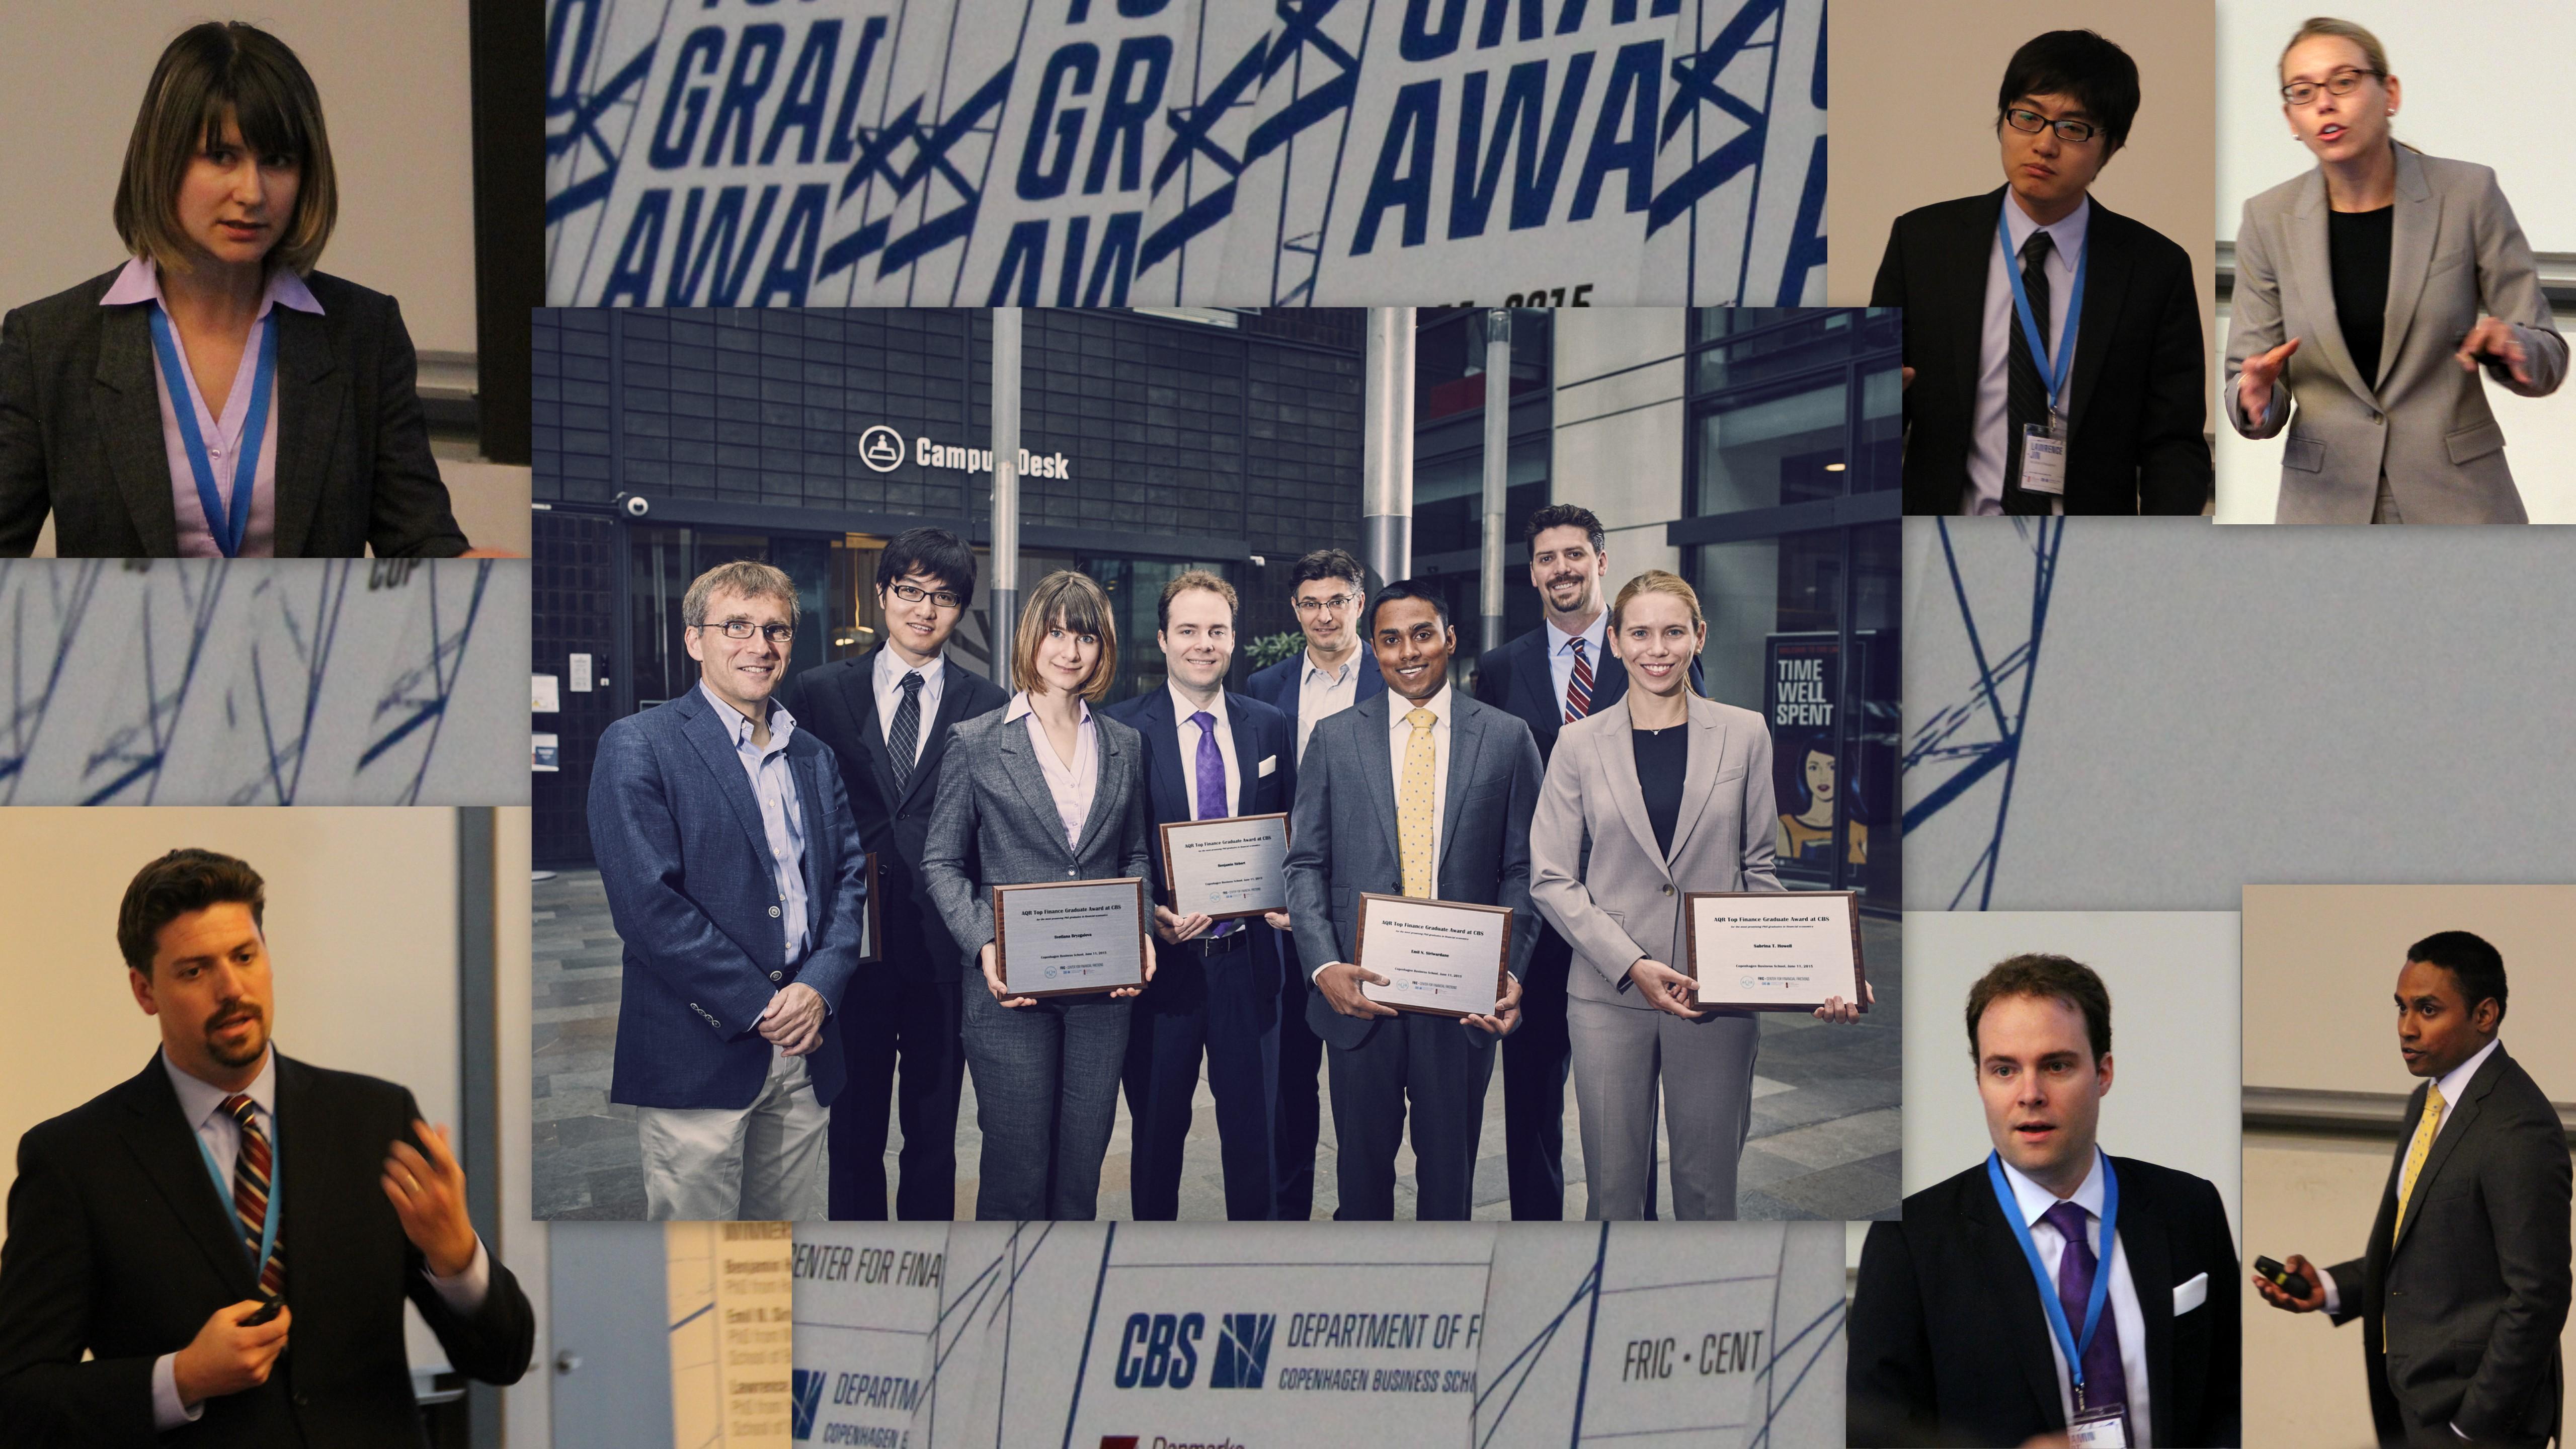 AQR Top Finance Graduate Award 2015 collage